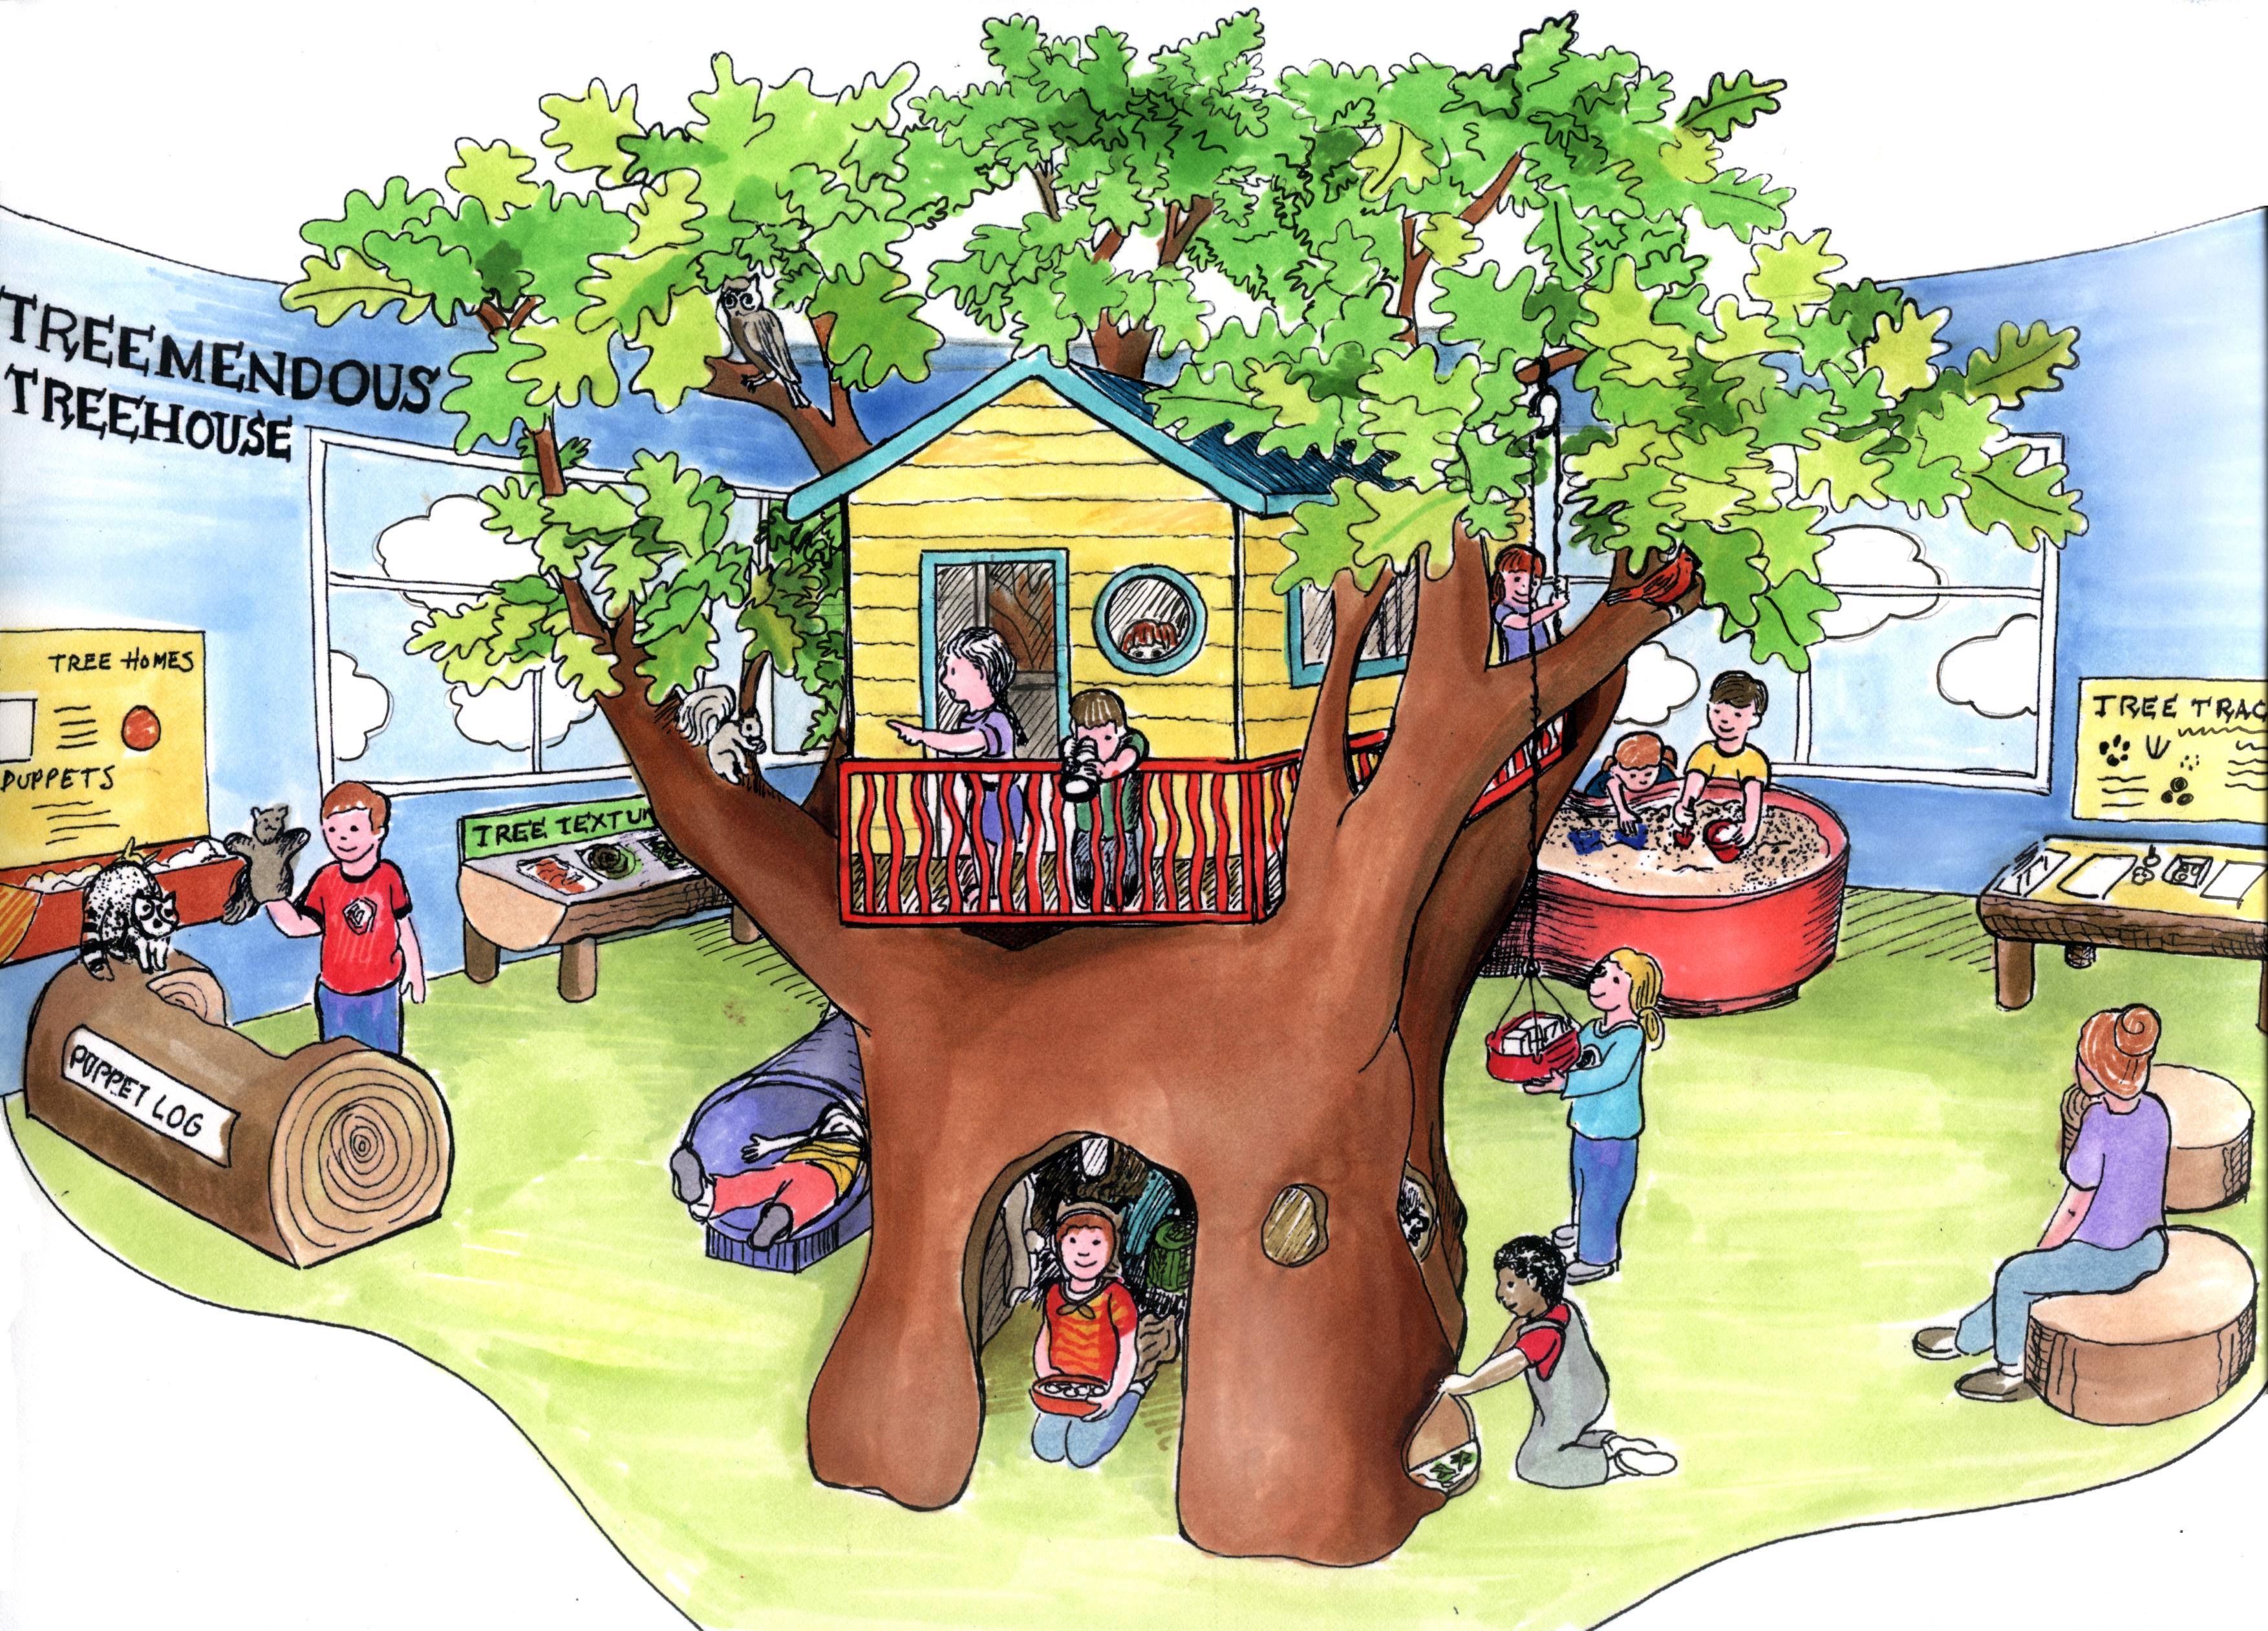 Conceptual Design: Treehouse